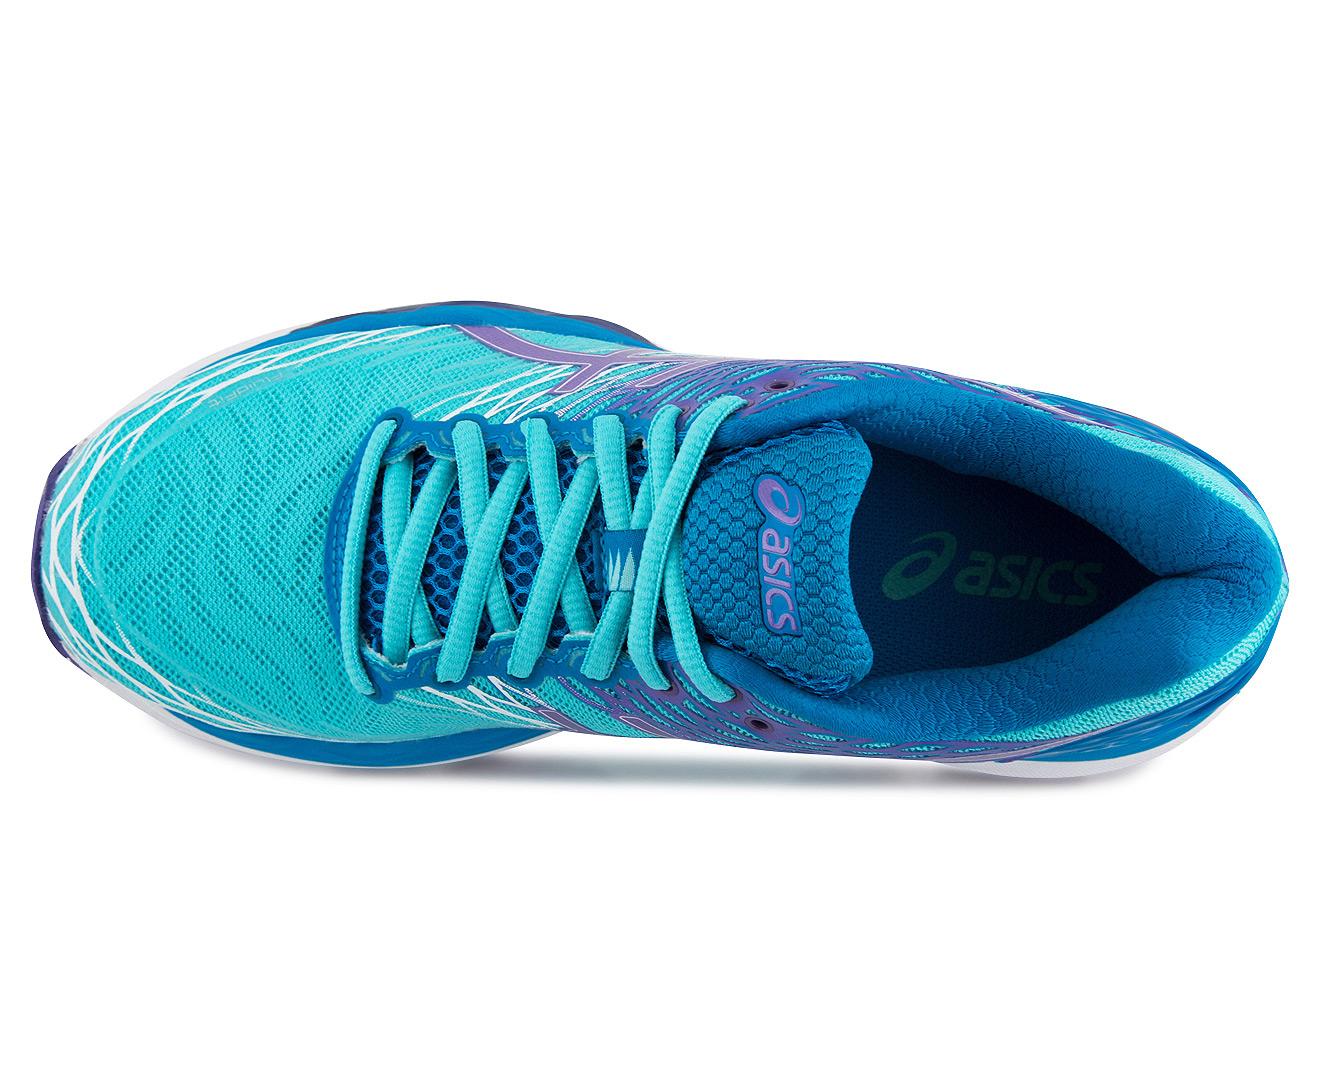 5d33e2c020a ASICS Women's GEL-Nimbus 18 Shoe - Turquoise/Iris/Methyl Blue